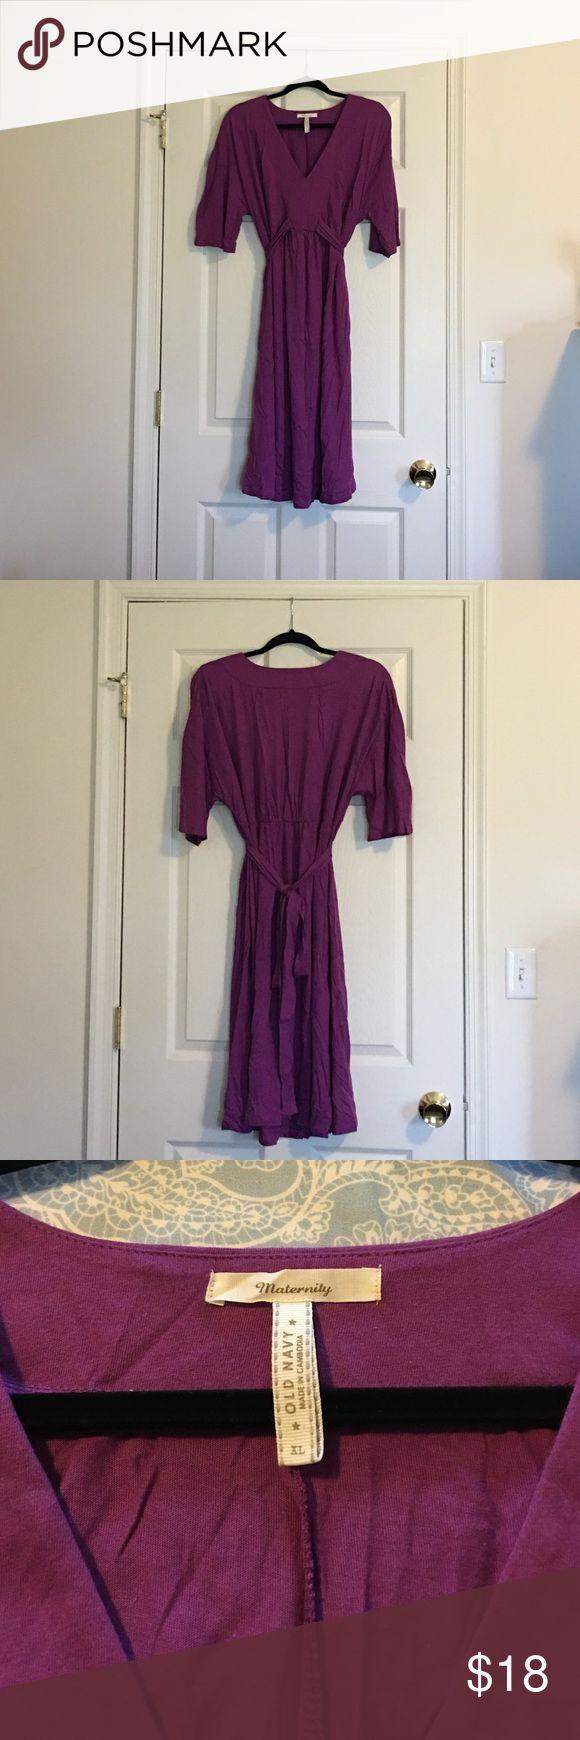 Purple Maternity Dress Old Navy Maternity purple cotton dress Old Navy Maternity Dresses